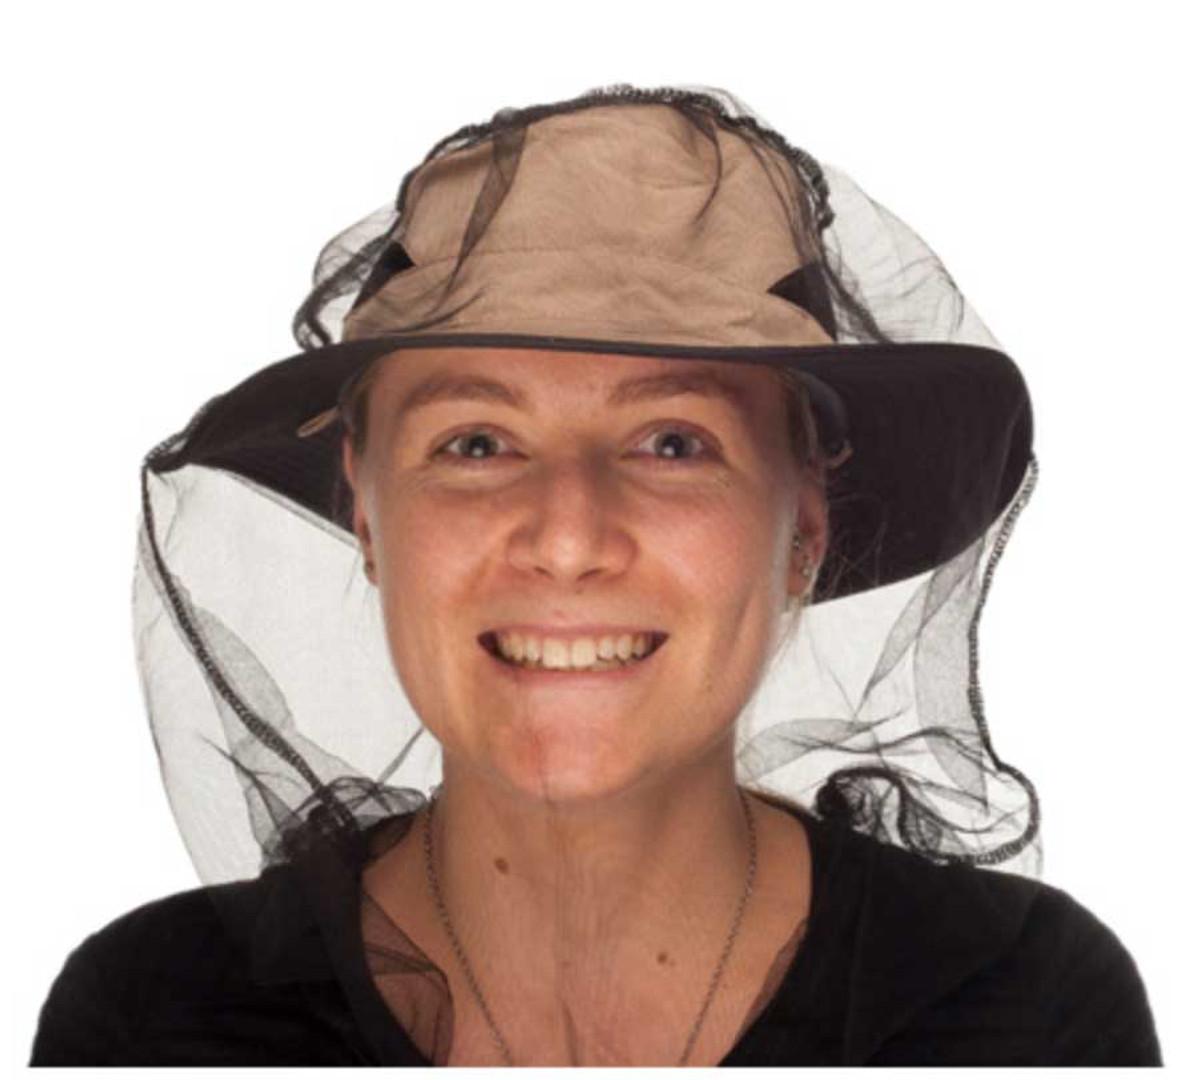 Sea to Summit nano mosquito head net